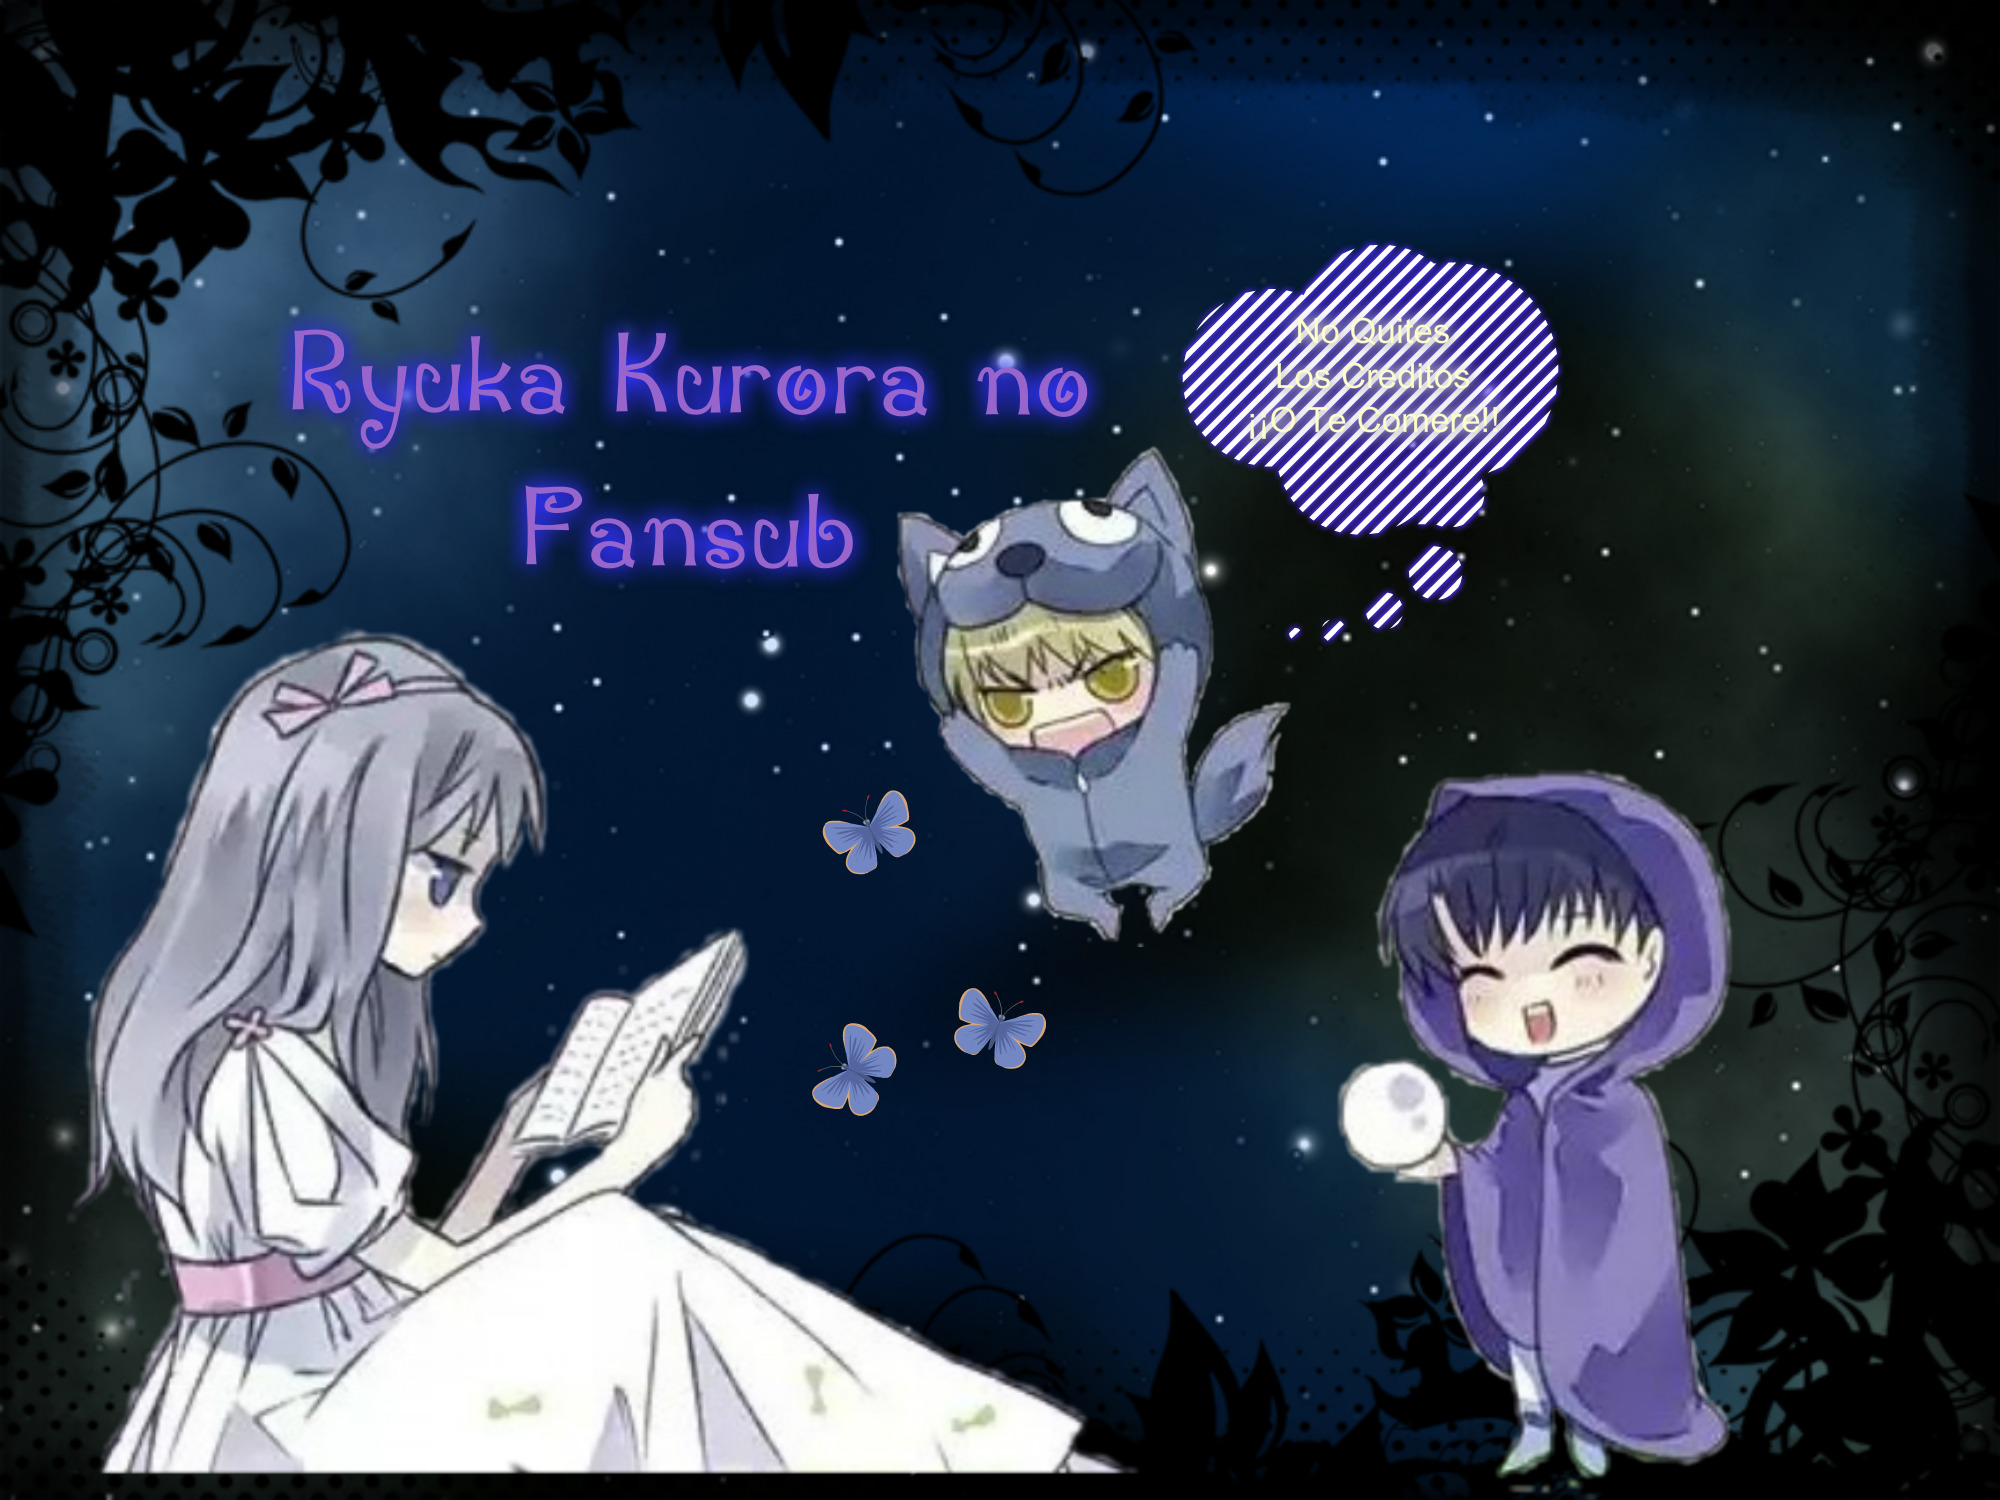 http://c5.ninemanga.com/es_manga/4/836/396437/4f1f29888cabf5d45f866fe457737a23.jpg Page 1